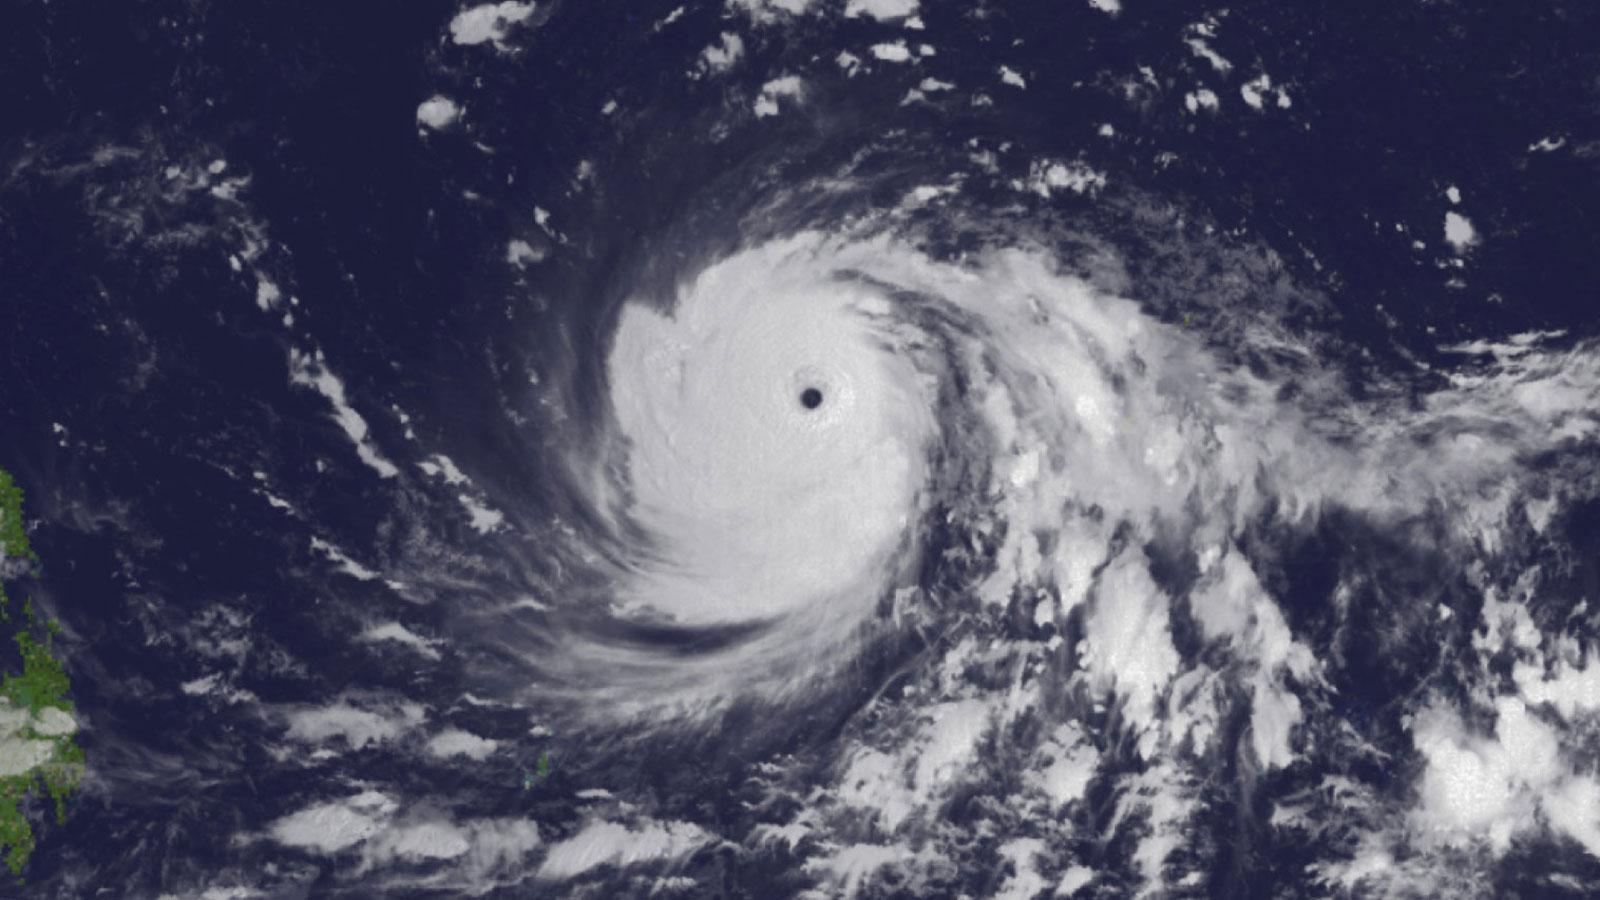 Philippines | HI teams prepare for Typhoon Mangkhut